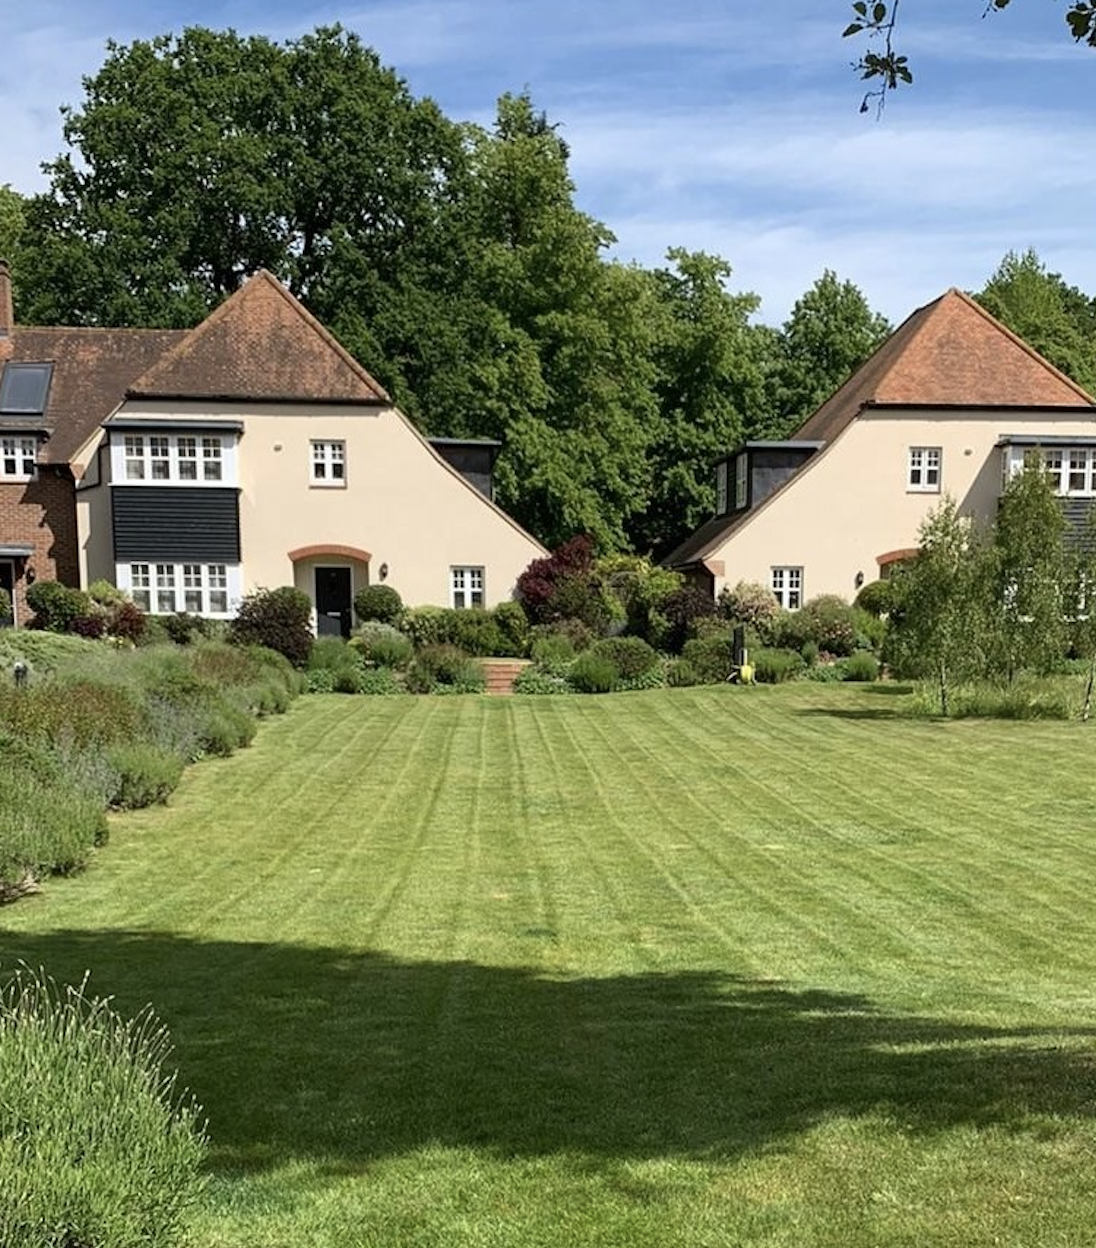 Lawn Maintenance Surrey, Berkshire, Hampshire